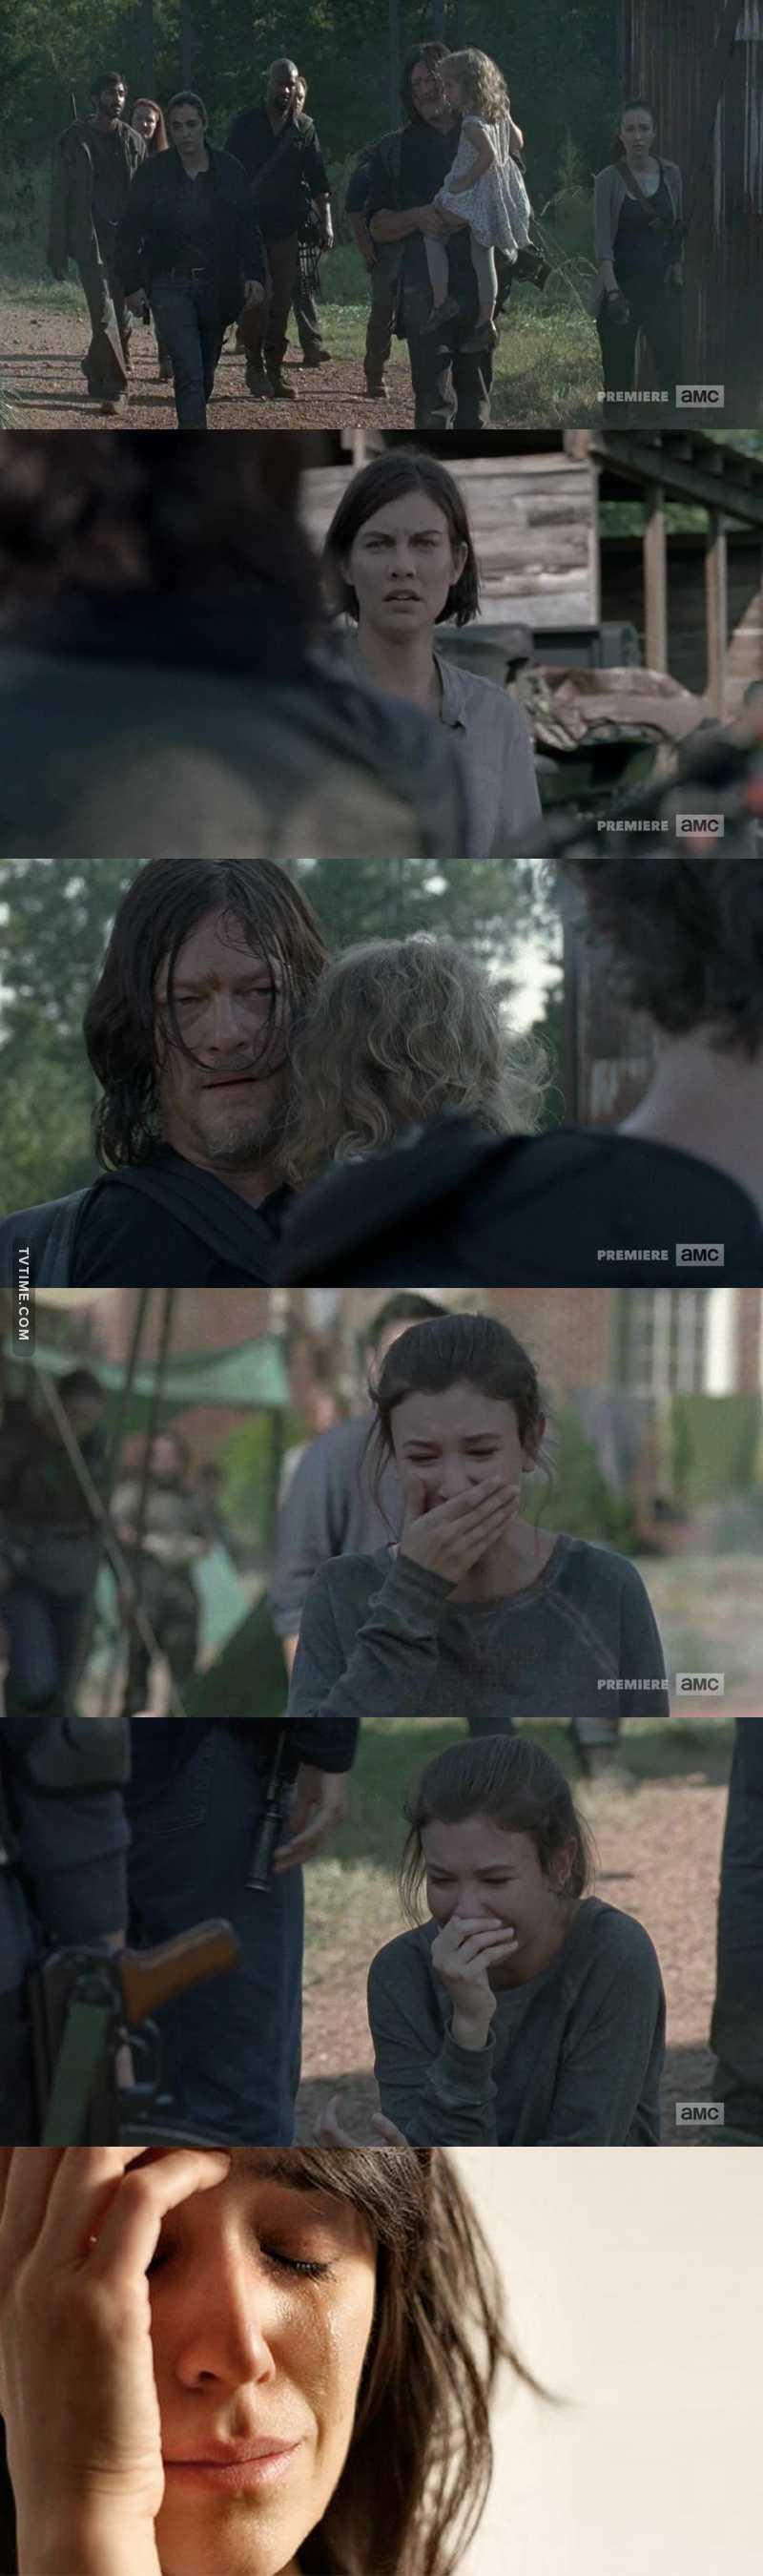 When i watch this scene